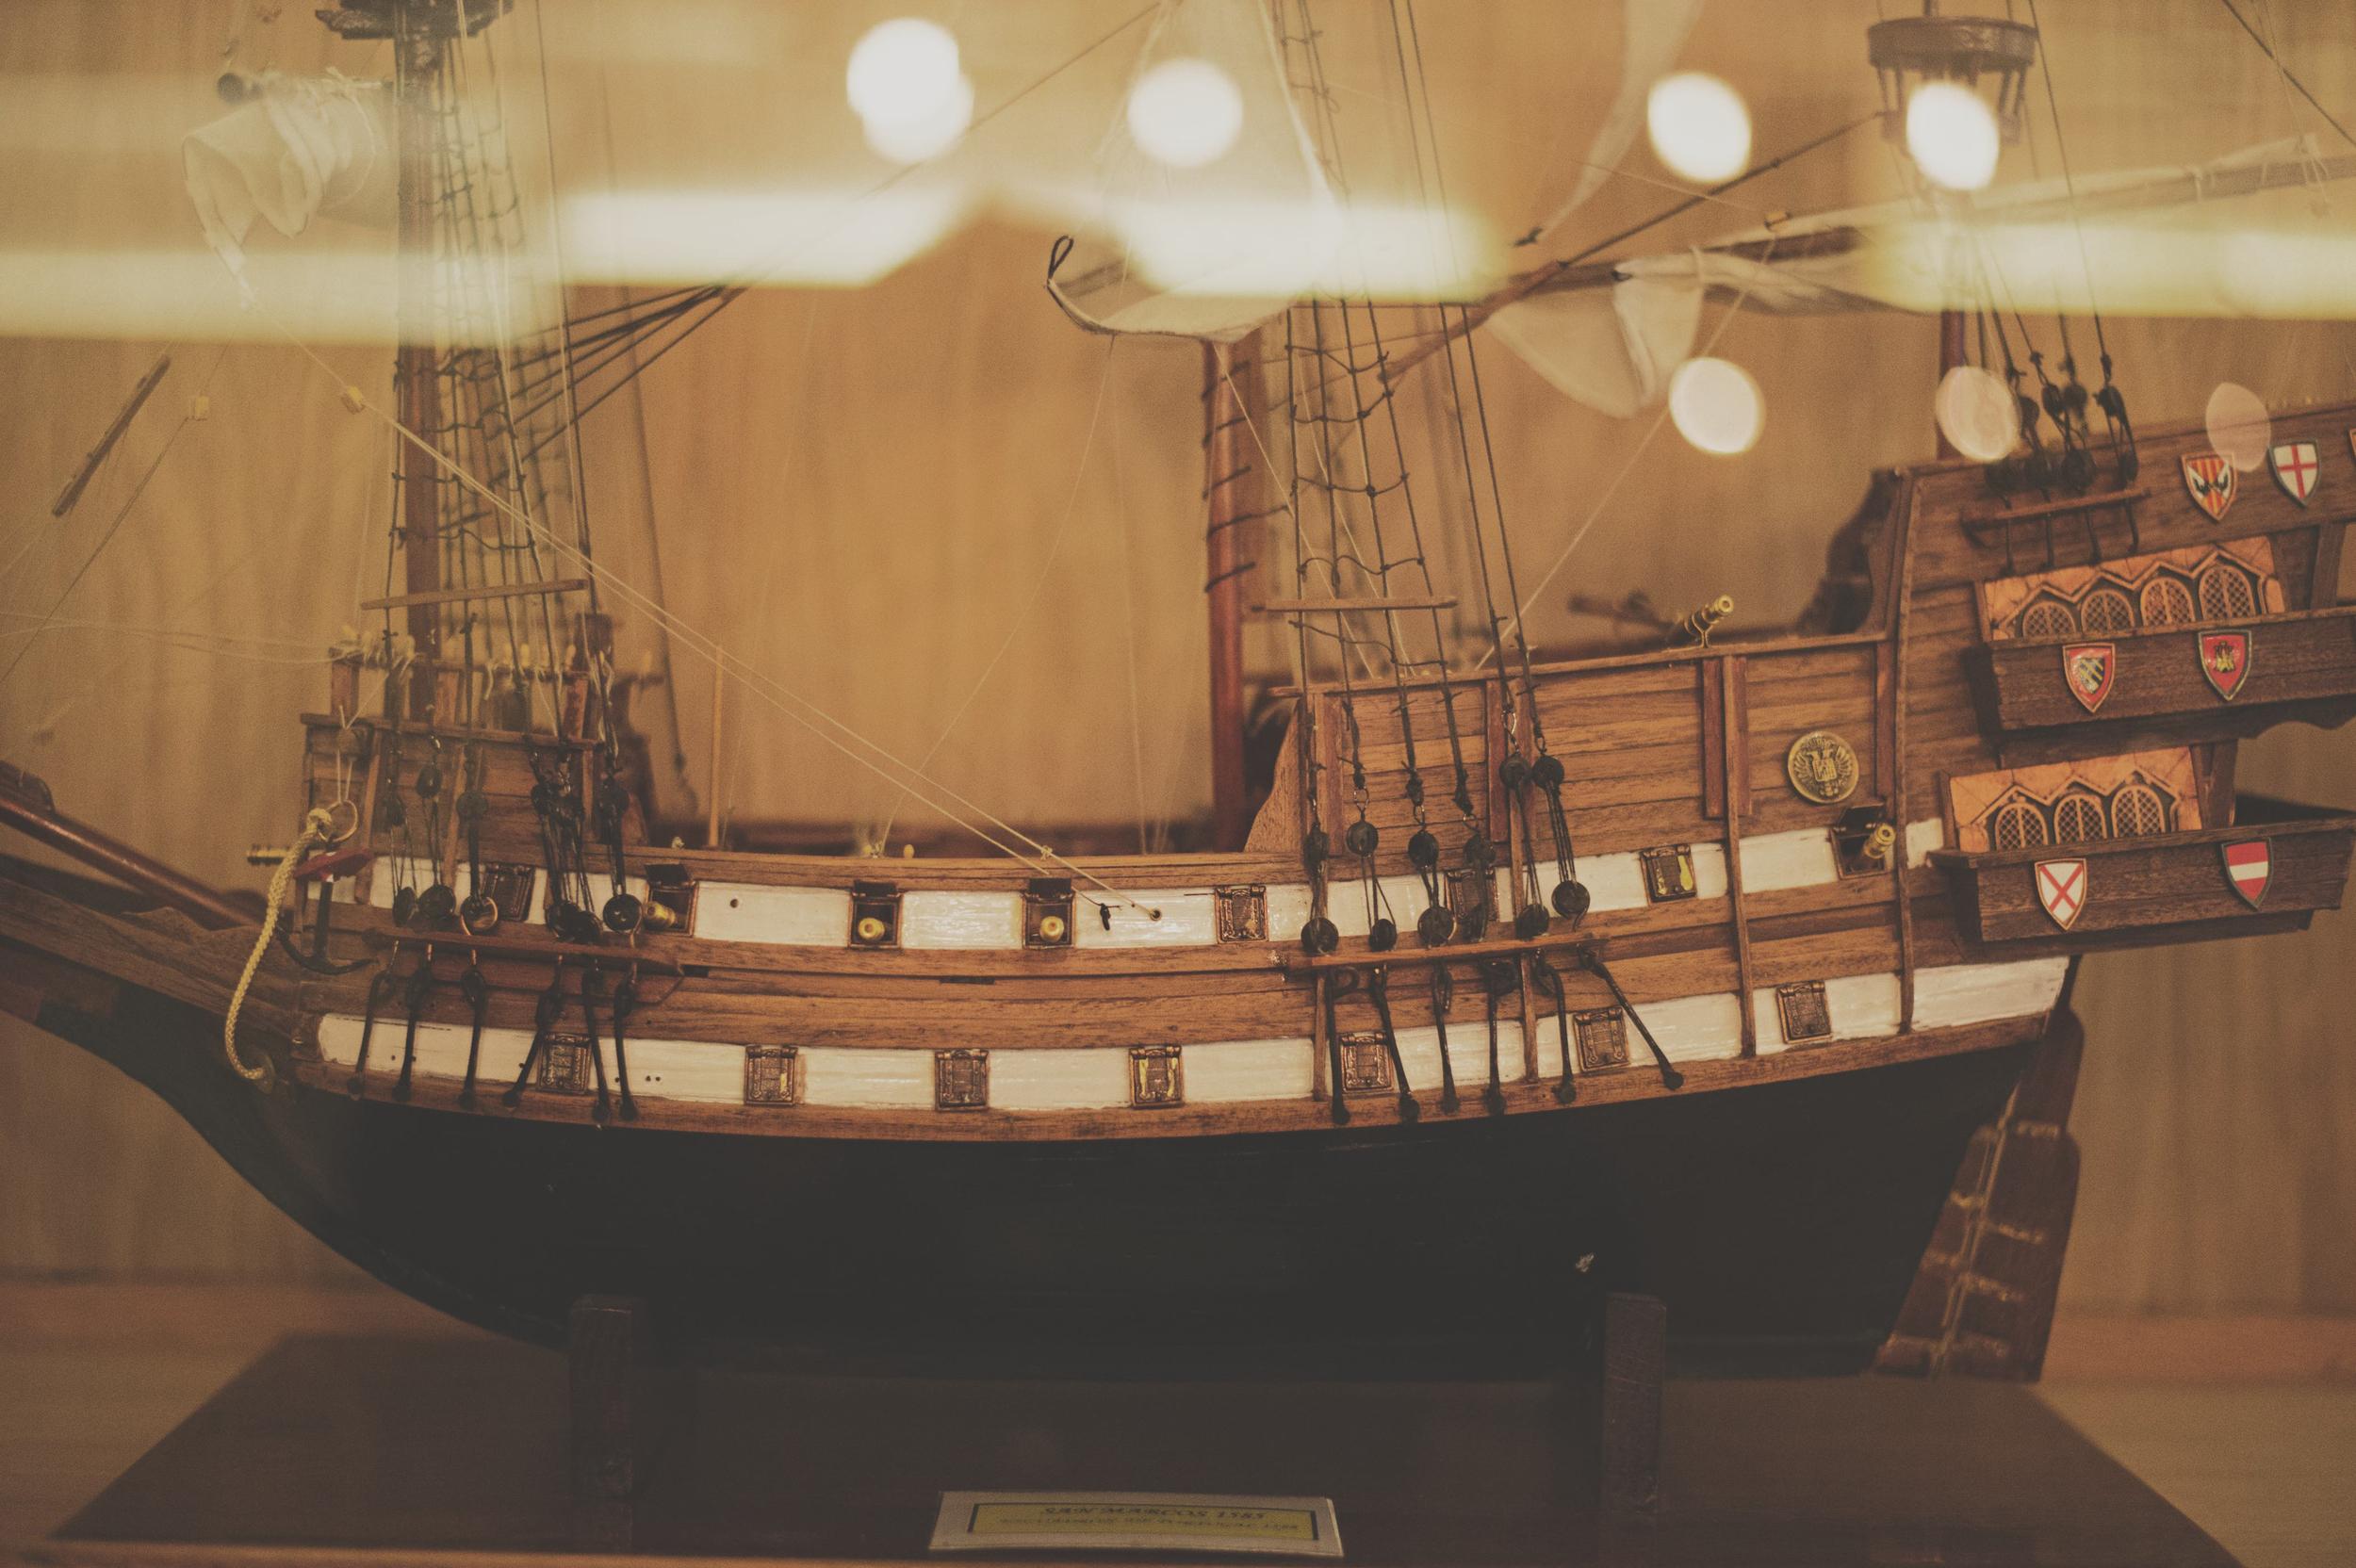 Spanish Point boat